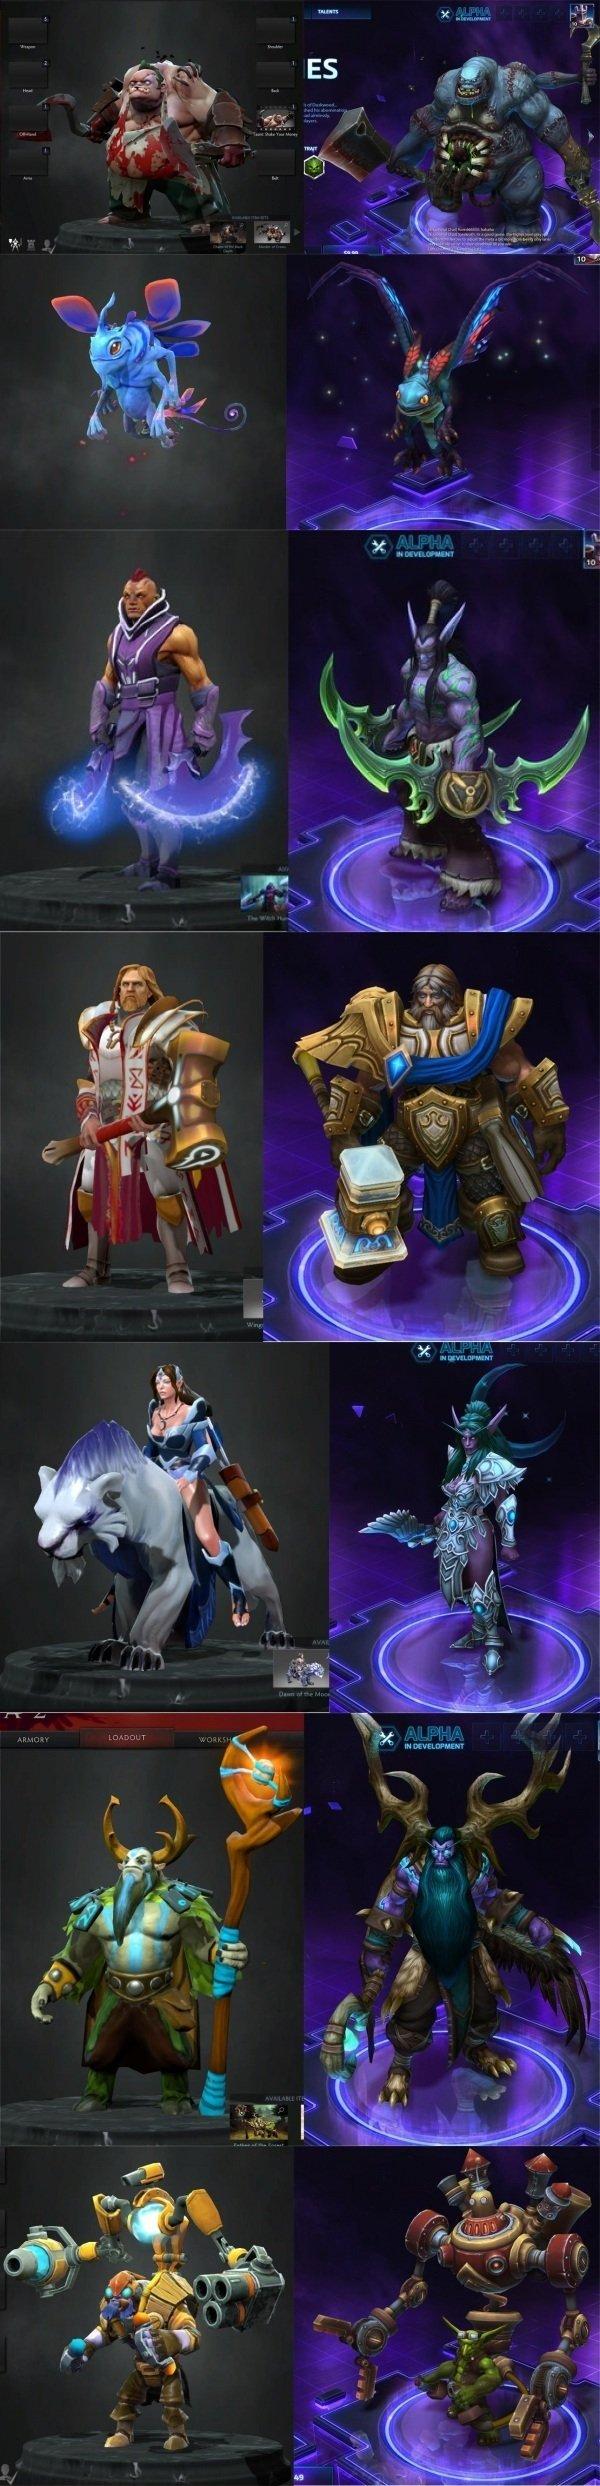 Valve - Blizzard. - Изображение 1